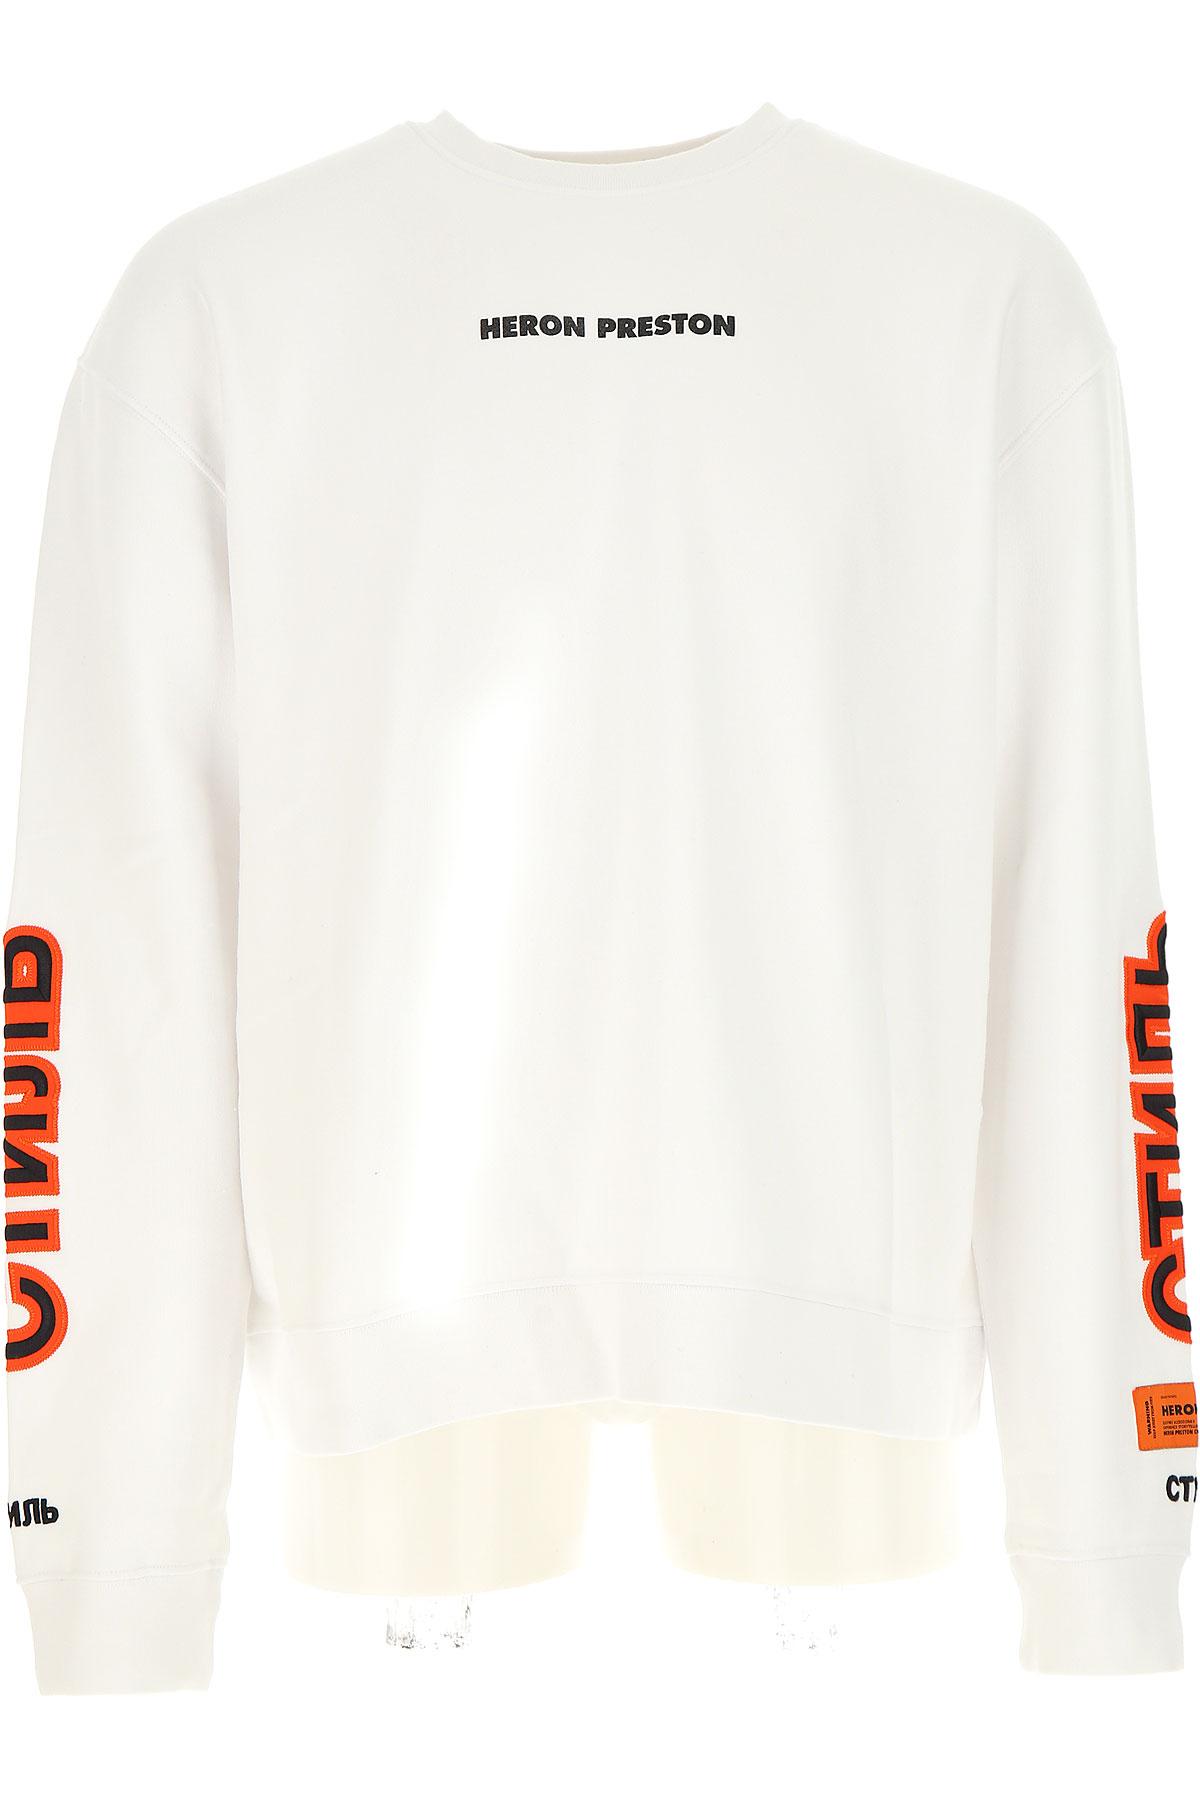 Image of Heron Preston Sweatshirt for Men, White, Cotton, 2017, L M XL